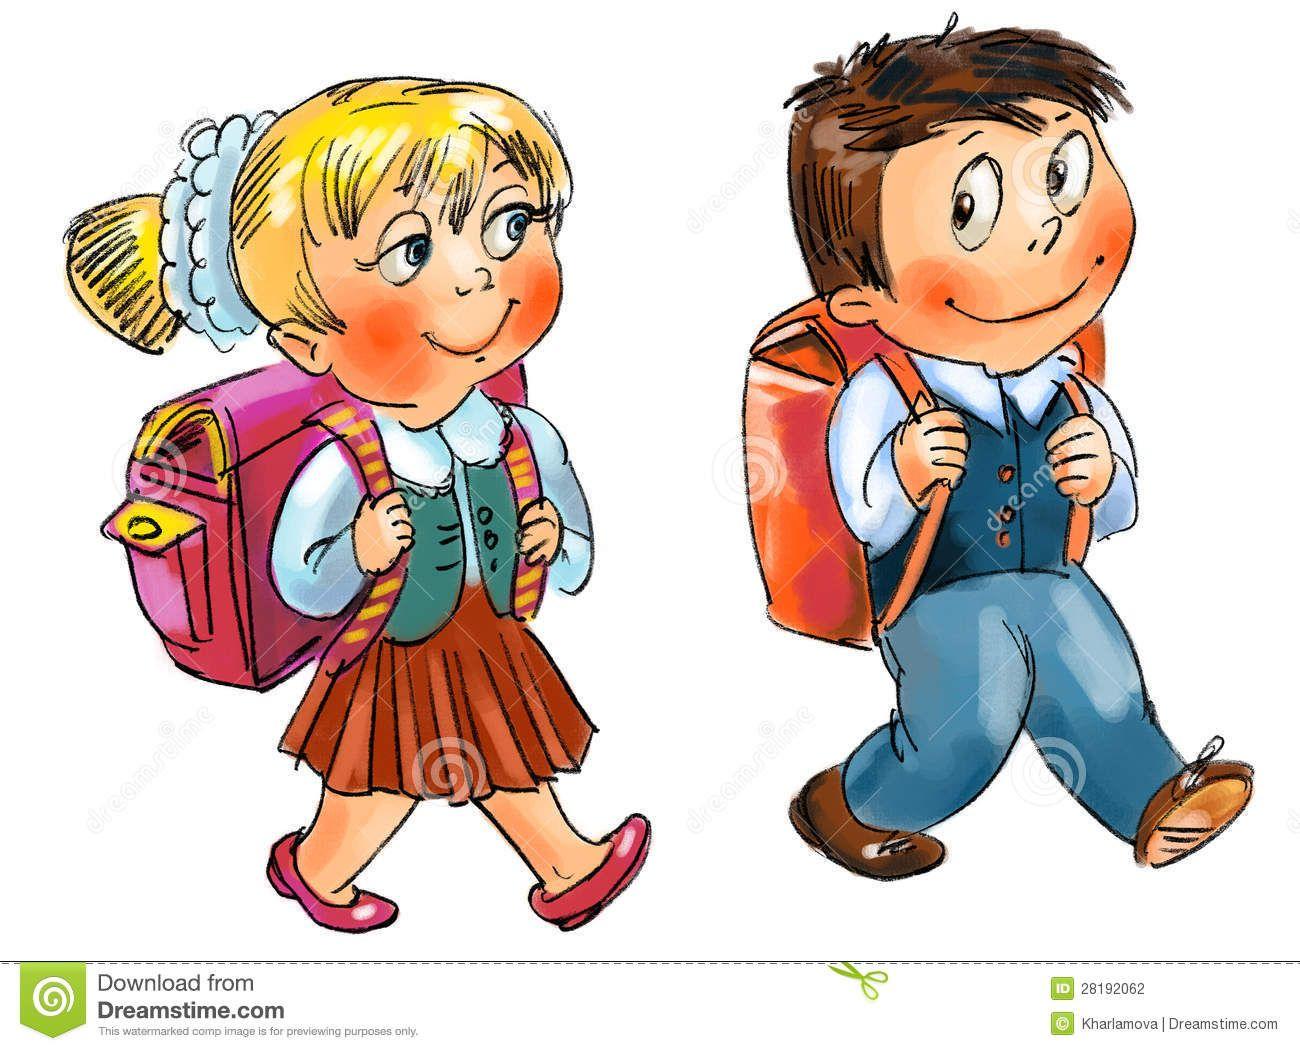 boy going to school clipart clipart school cliparts pinterest rh pinterest com kid going to school clipart girl going to school clipart